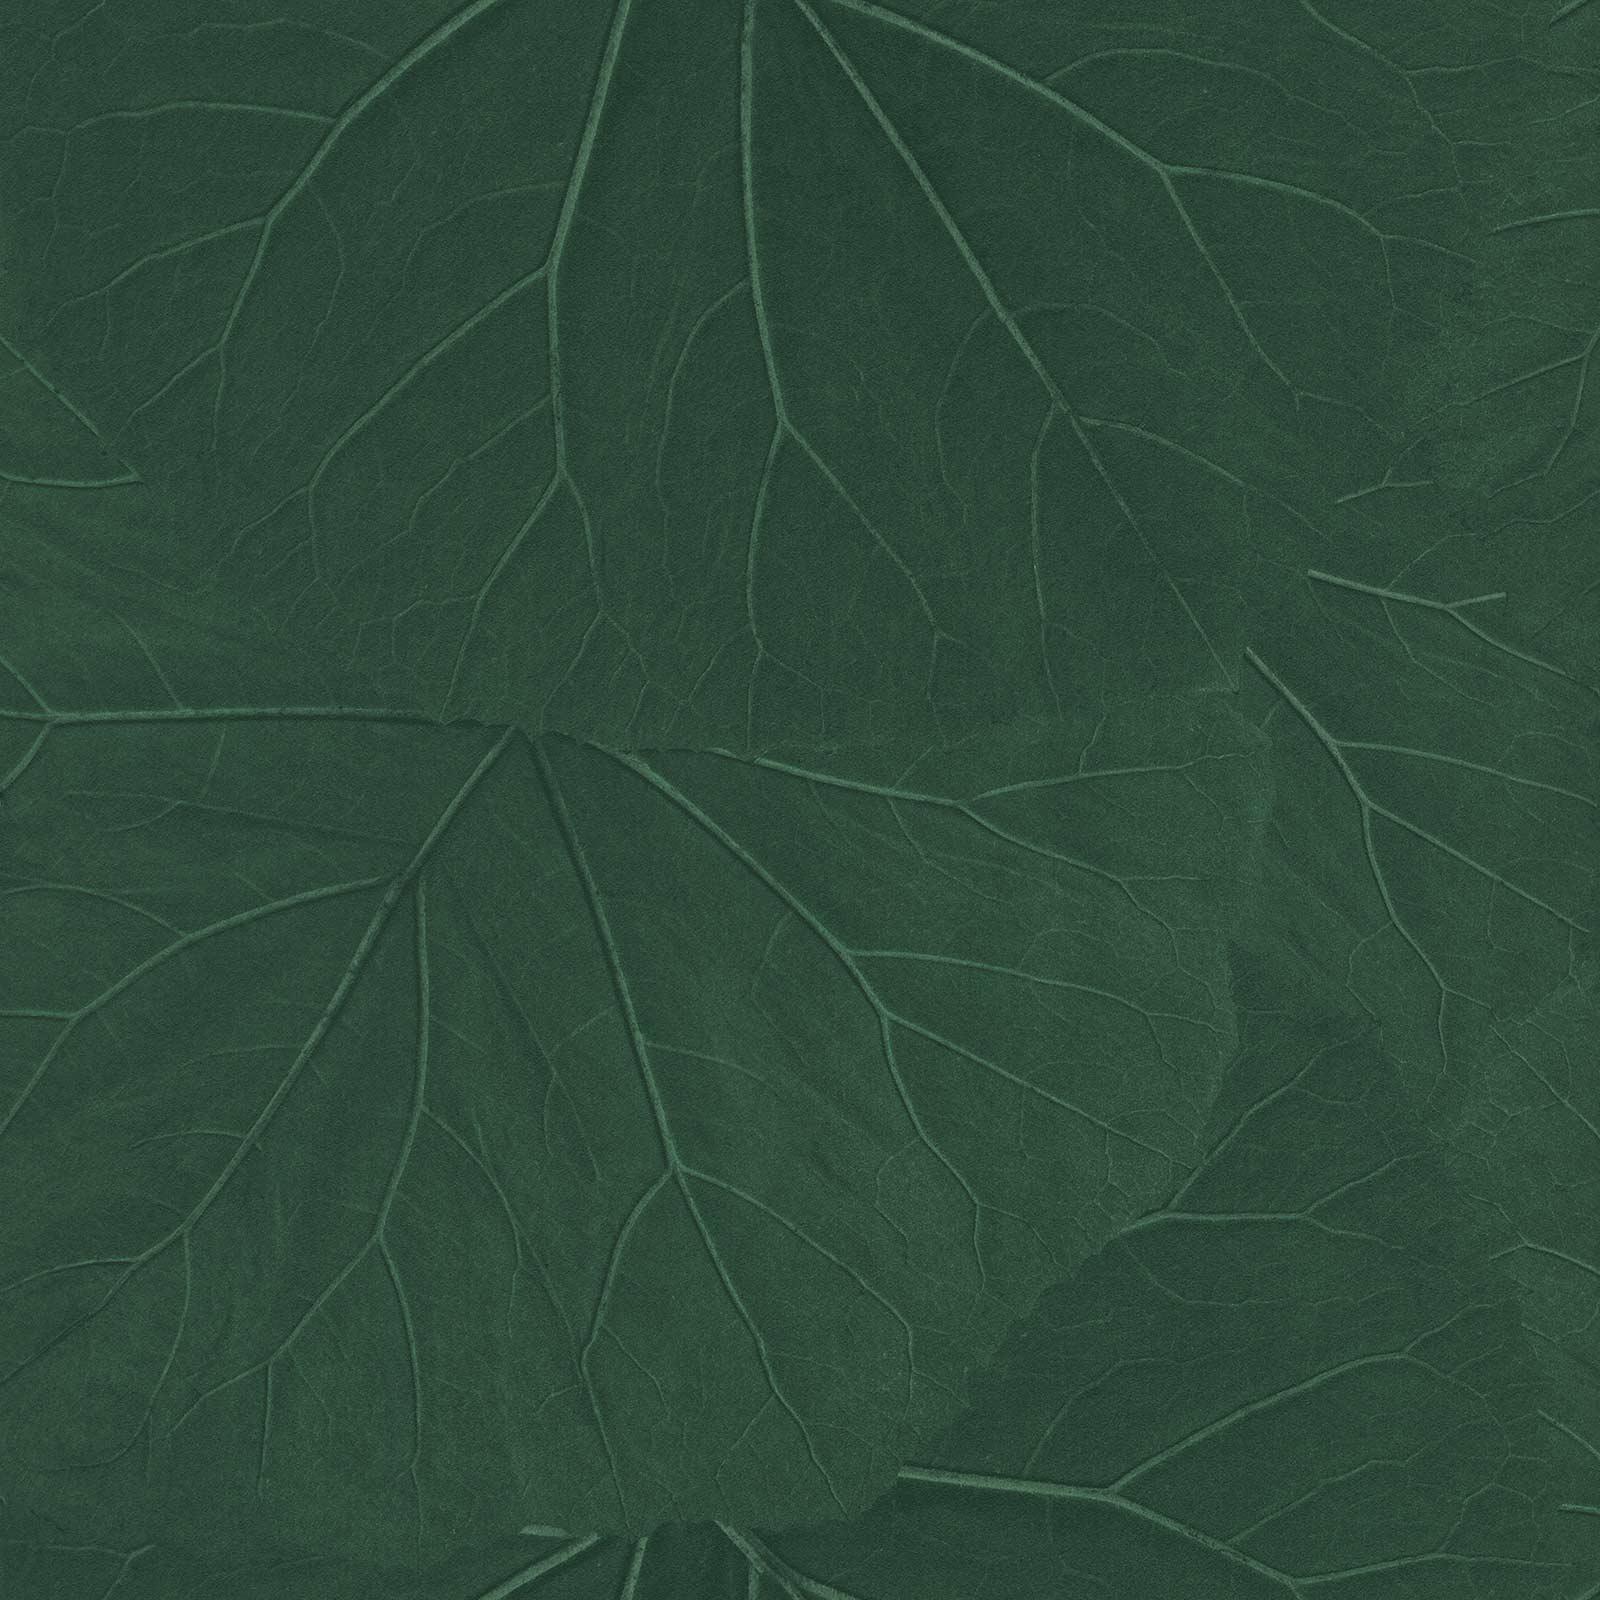 Non Woven Wallpaper Leaves 3d Floral Dark Green 138997